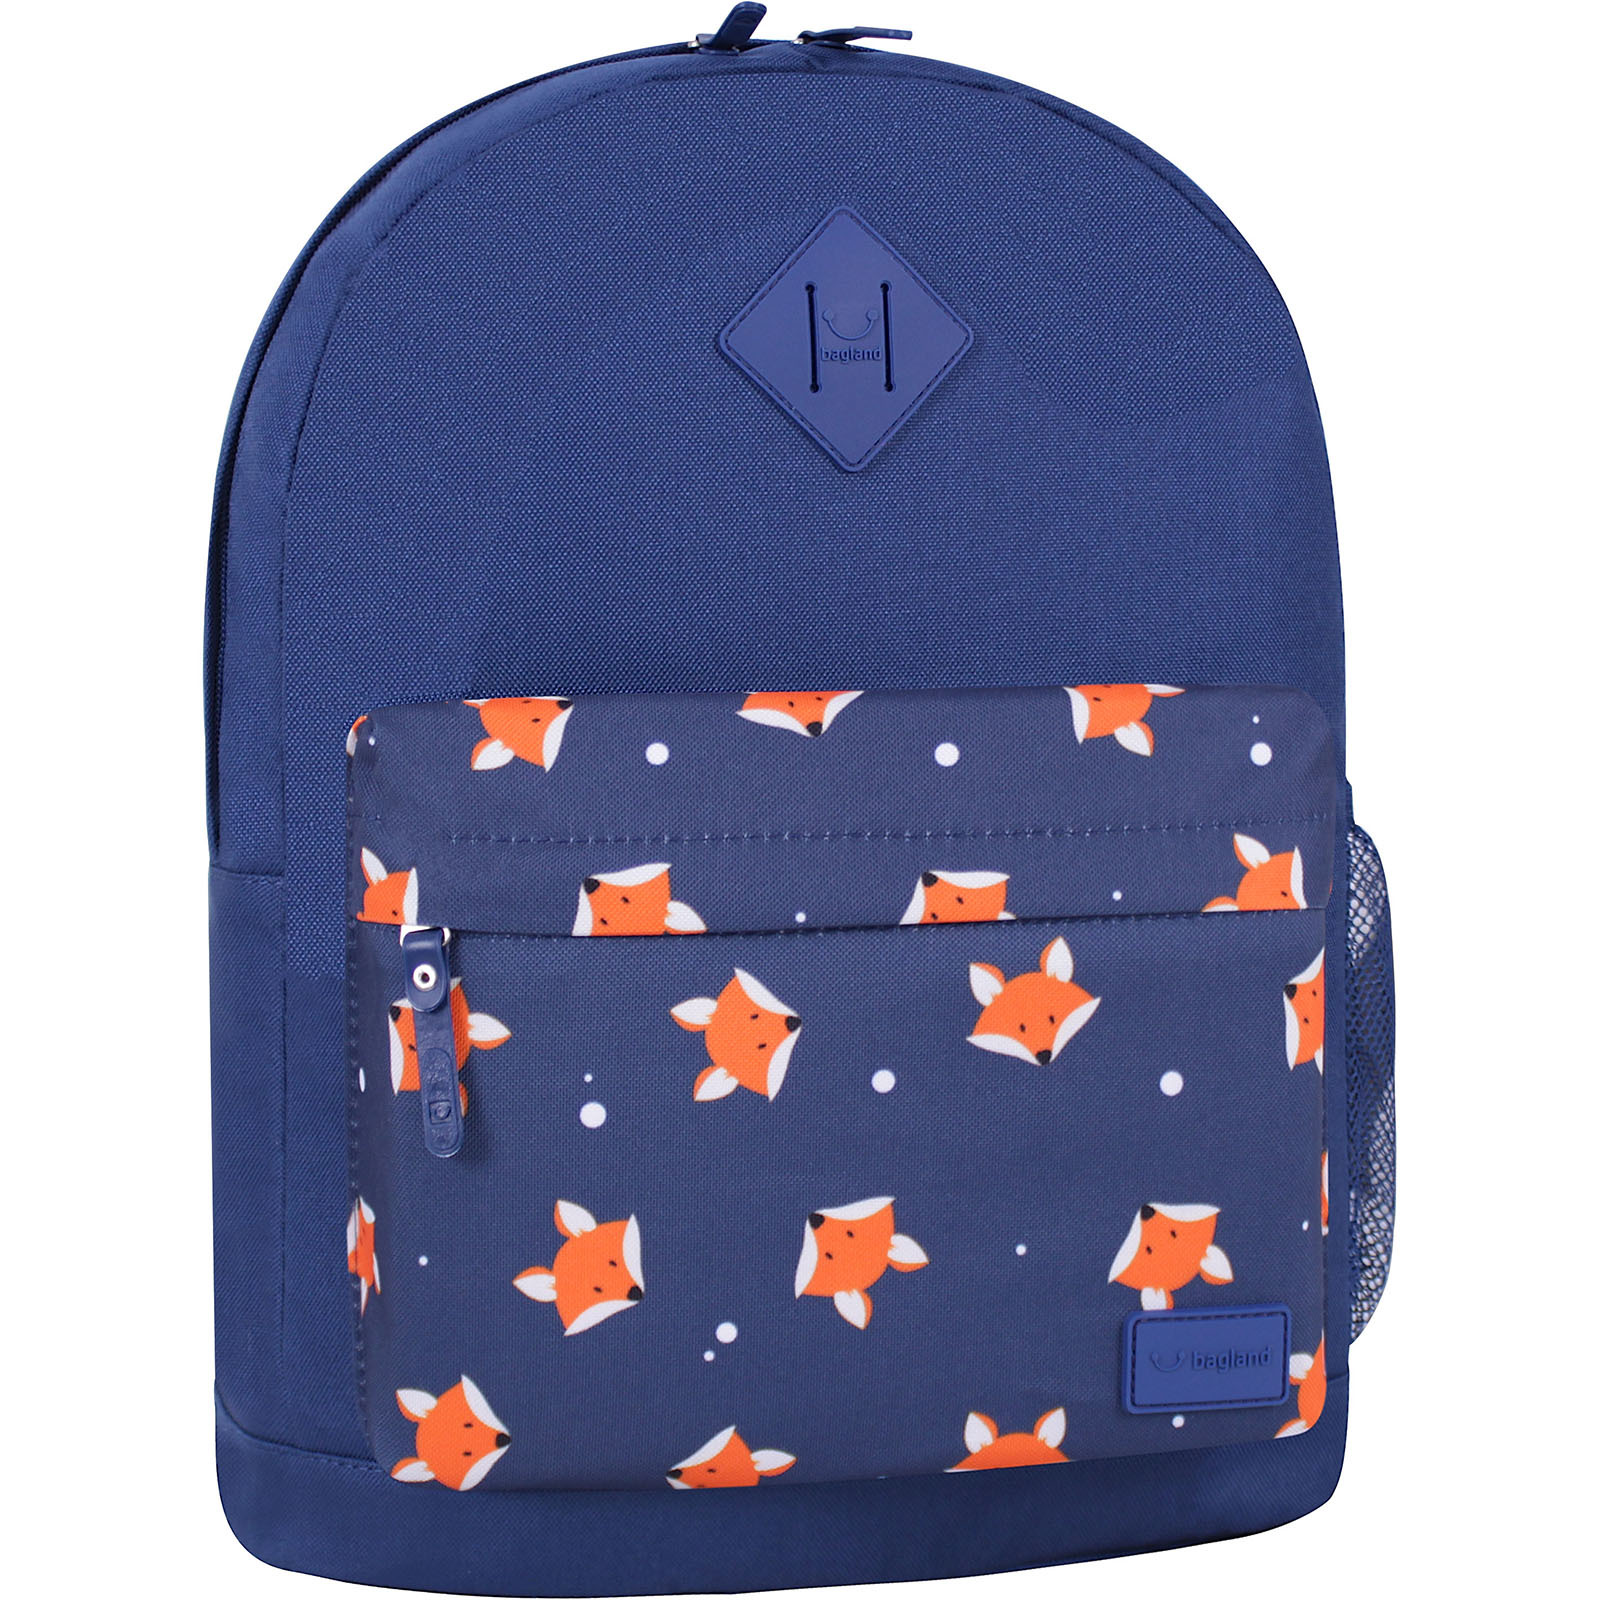 Городские рюкзаки Рюкзак Bagland Молодежный W/R 17 л. Синий 742 (00533662) IMG_6534_суб742_-1600.jpg